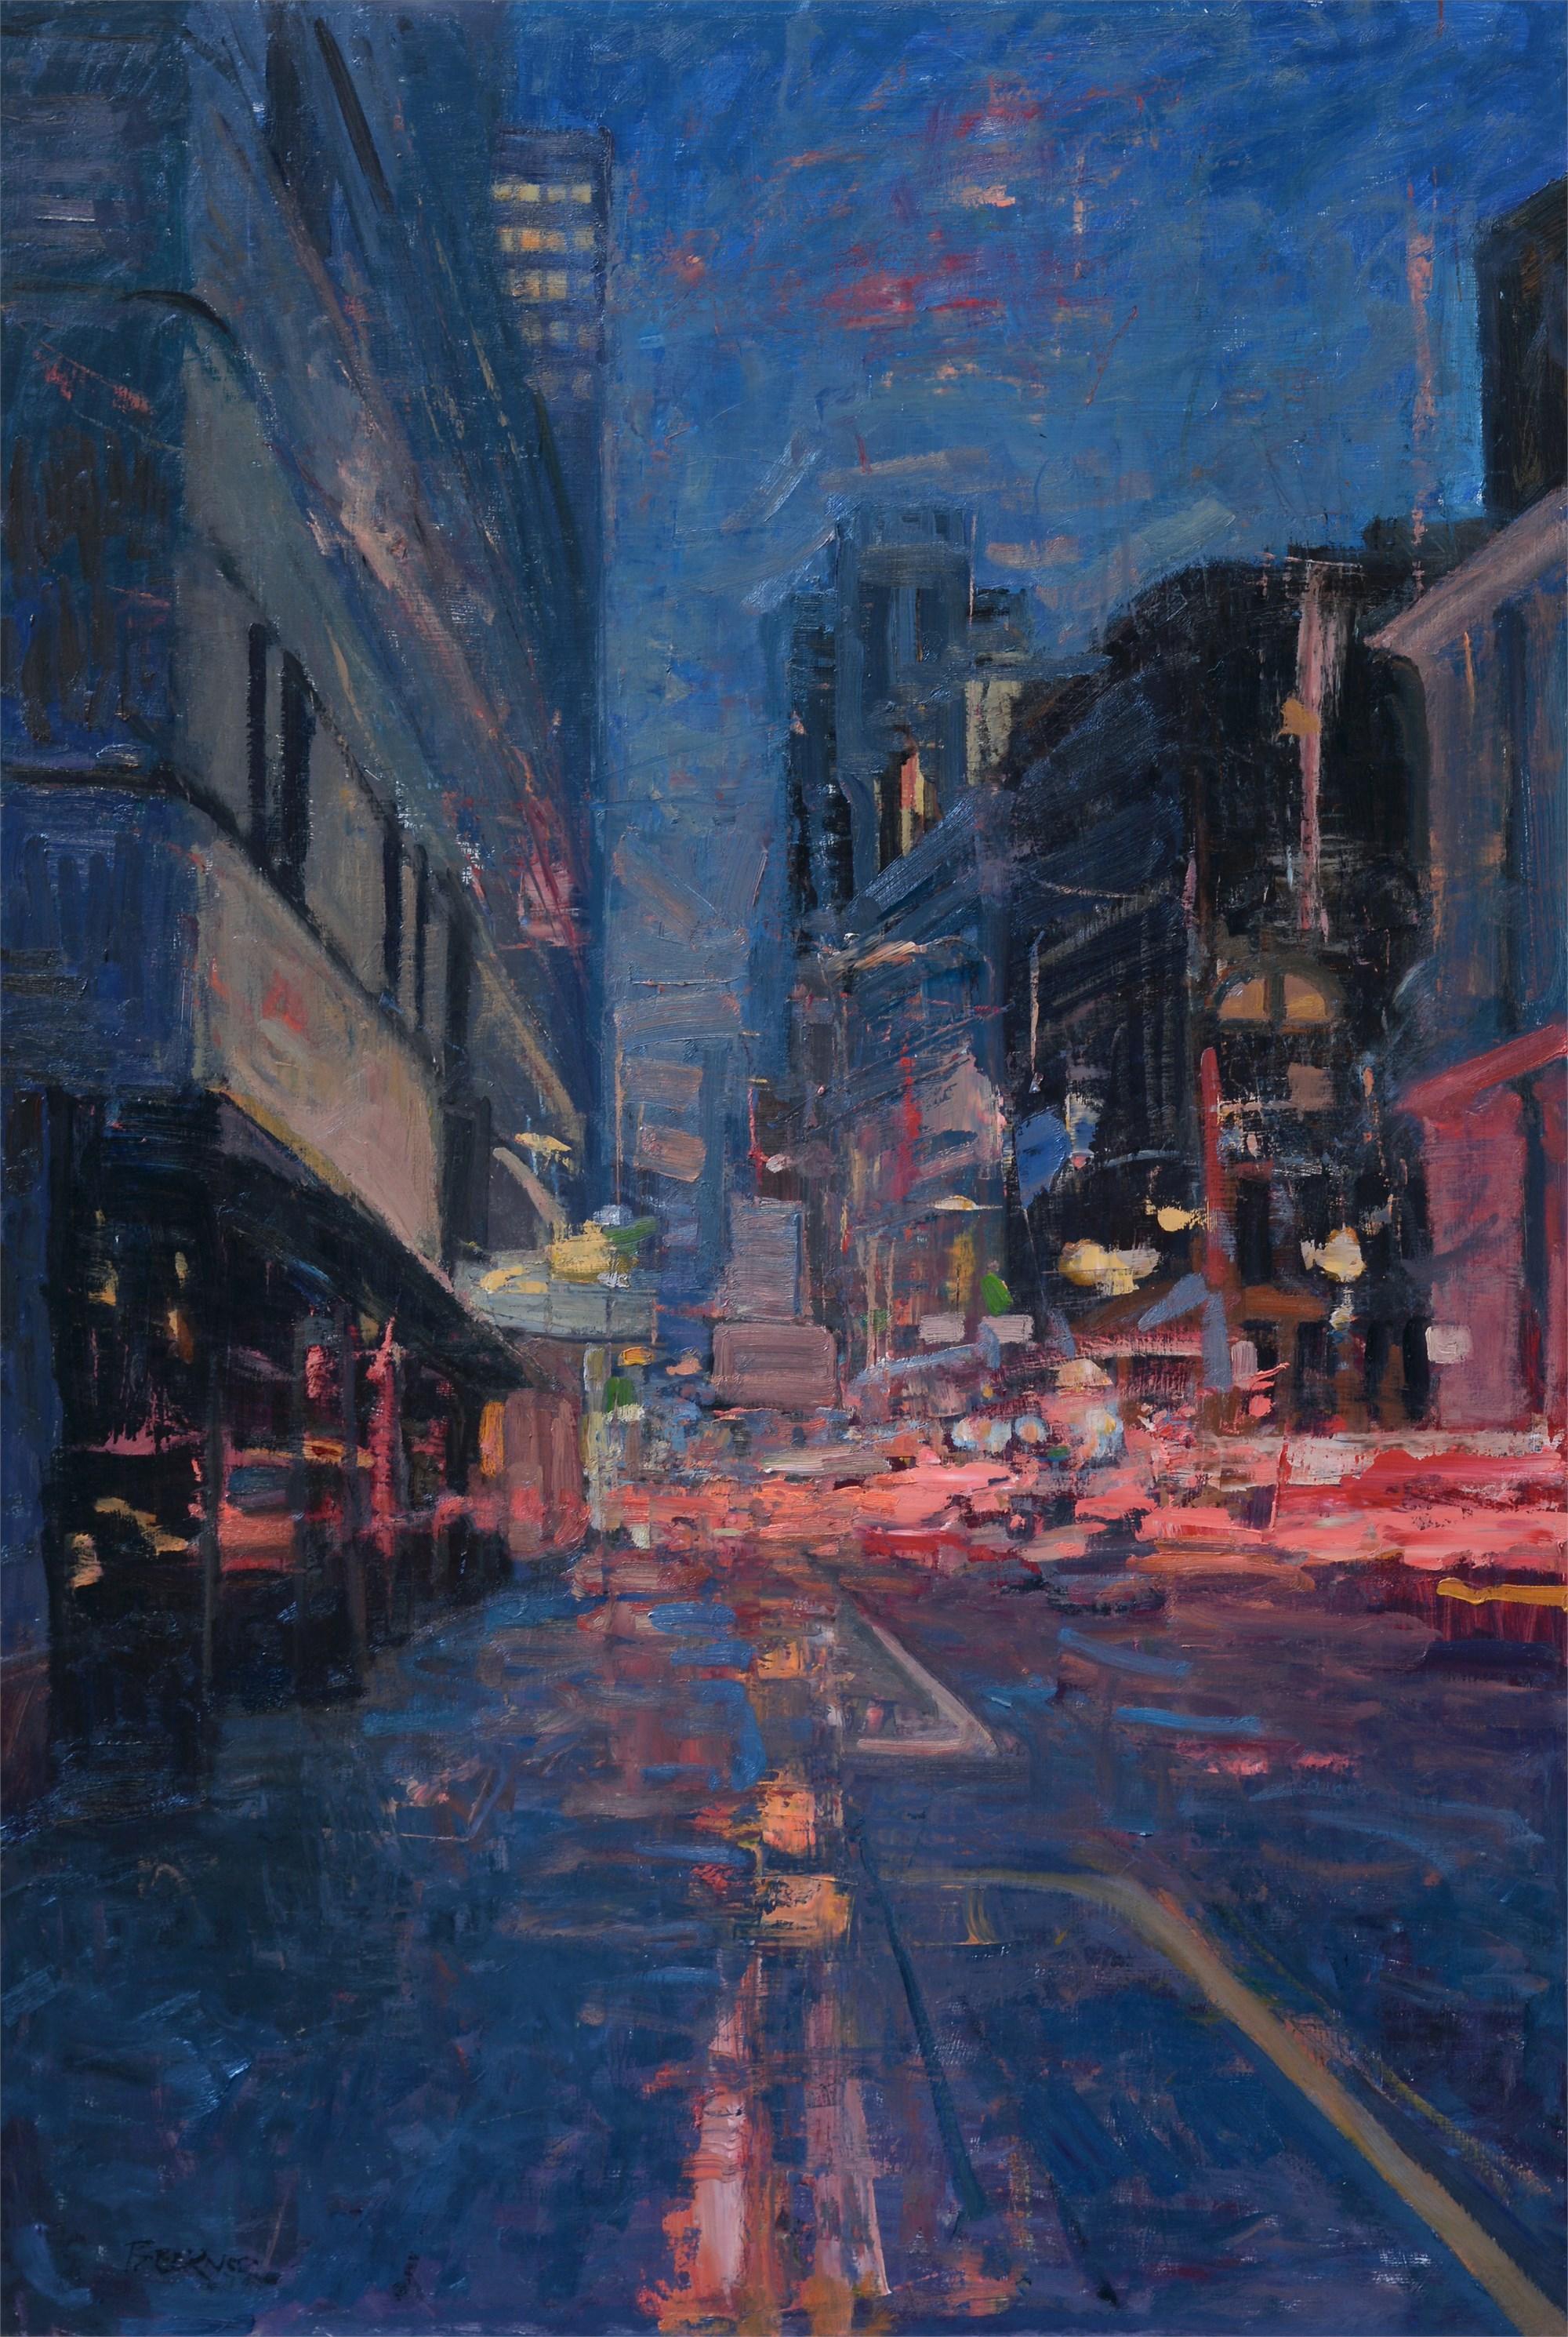 6 pm by Jim Beckner